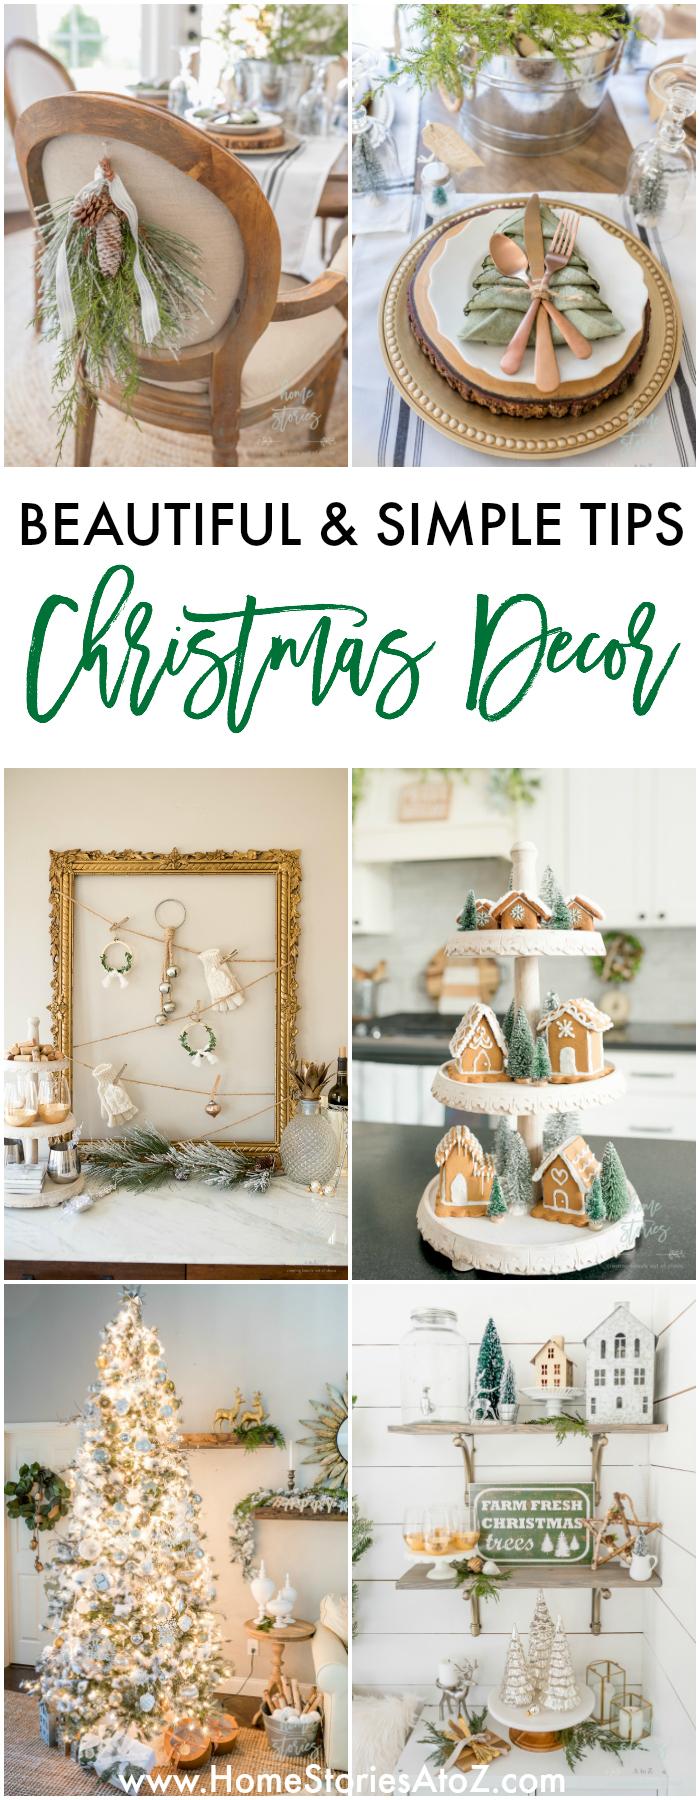 10 Beautiful and Simple Christmas Decor Tips